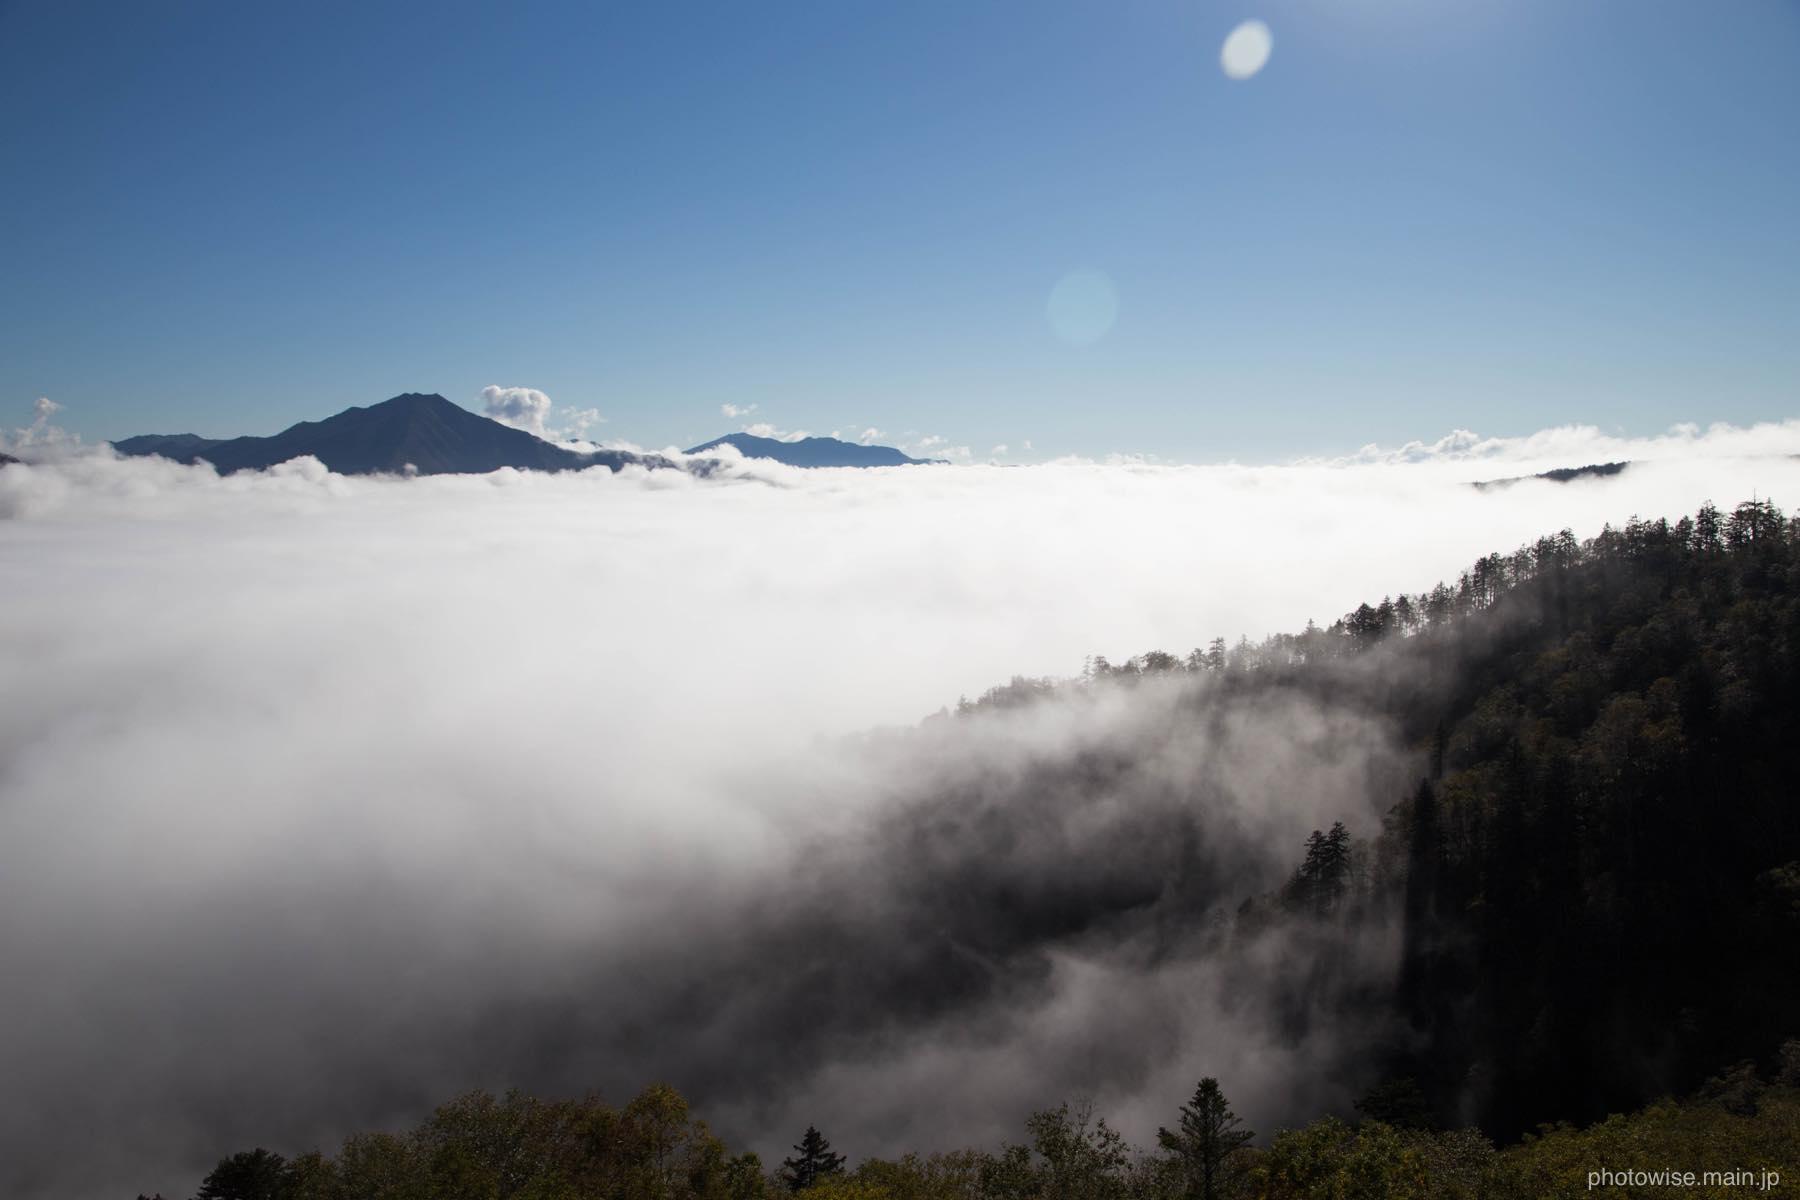 黒岳五合目の雲海